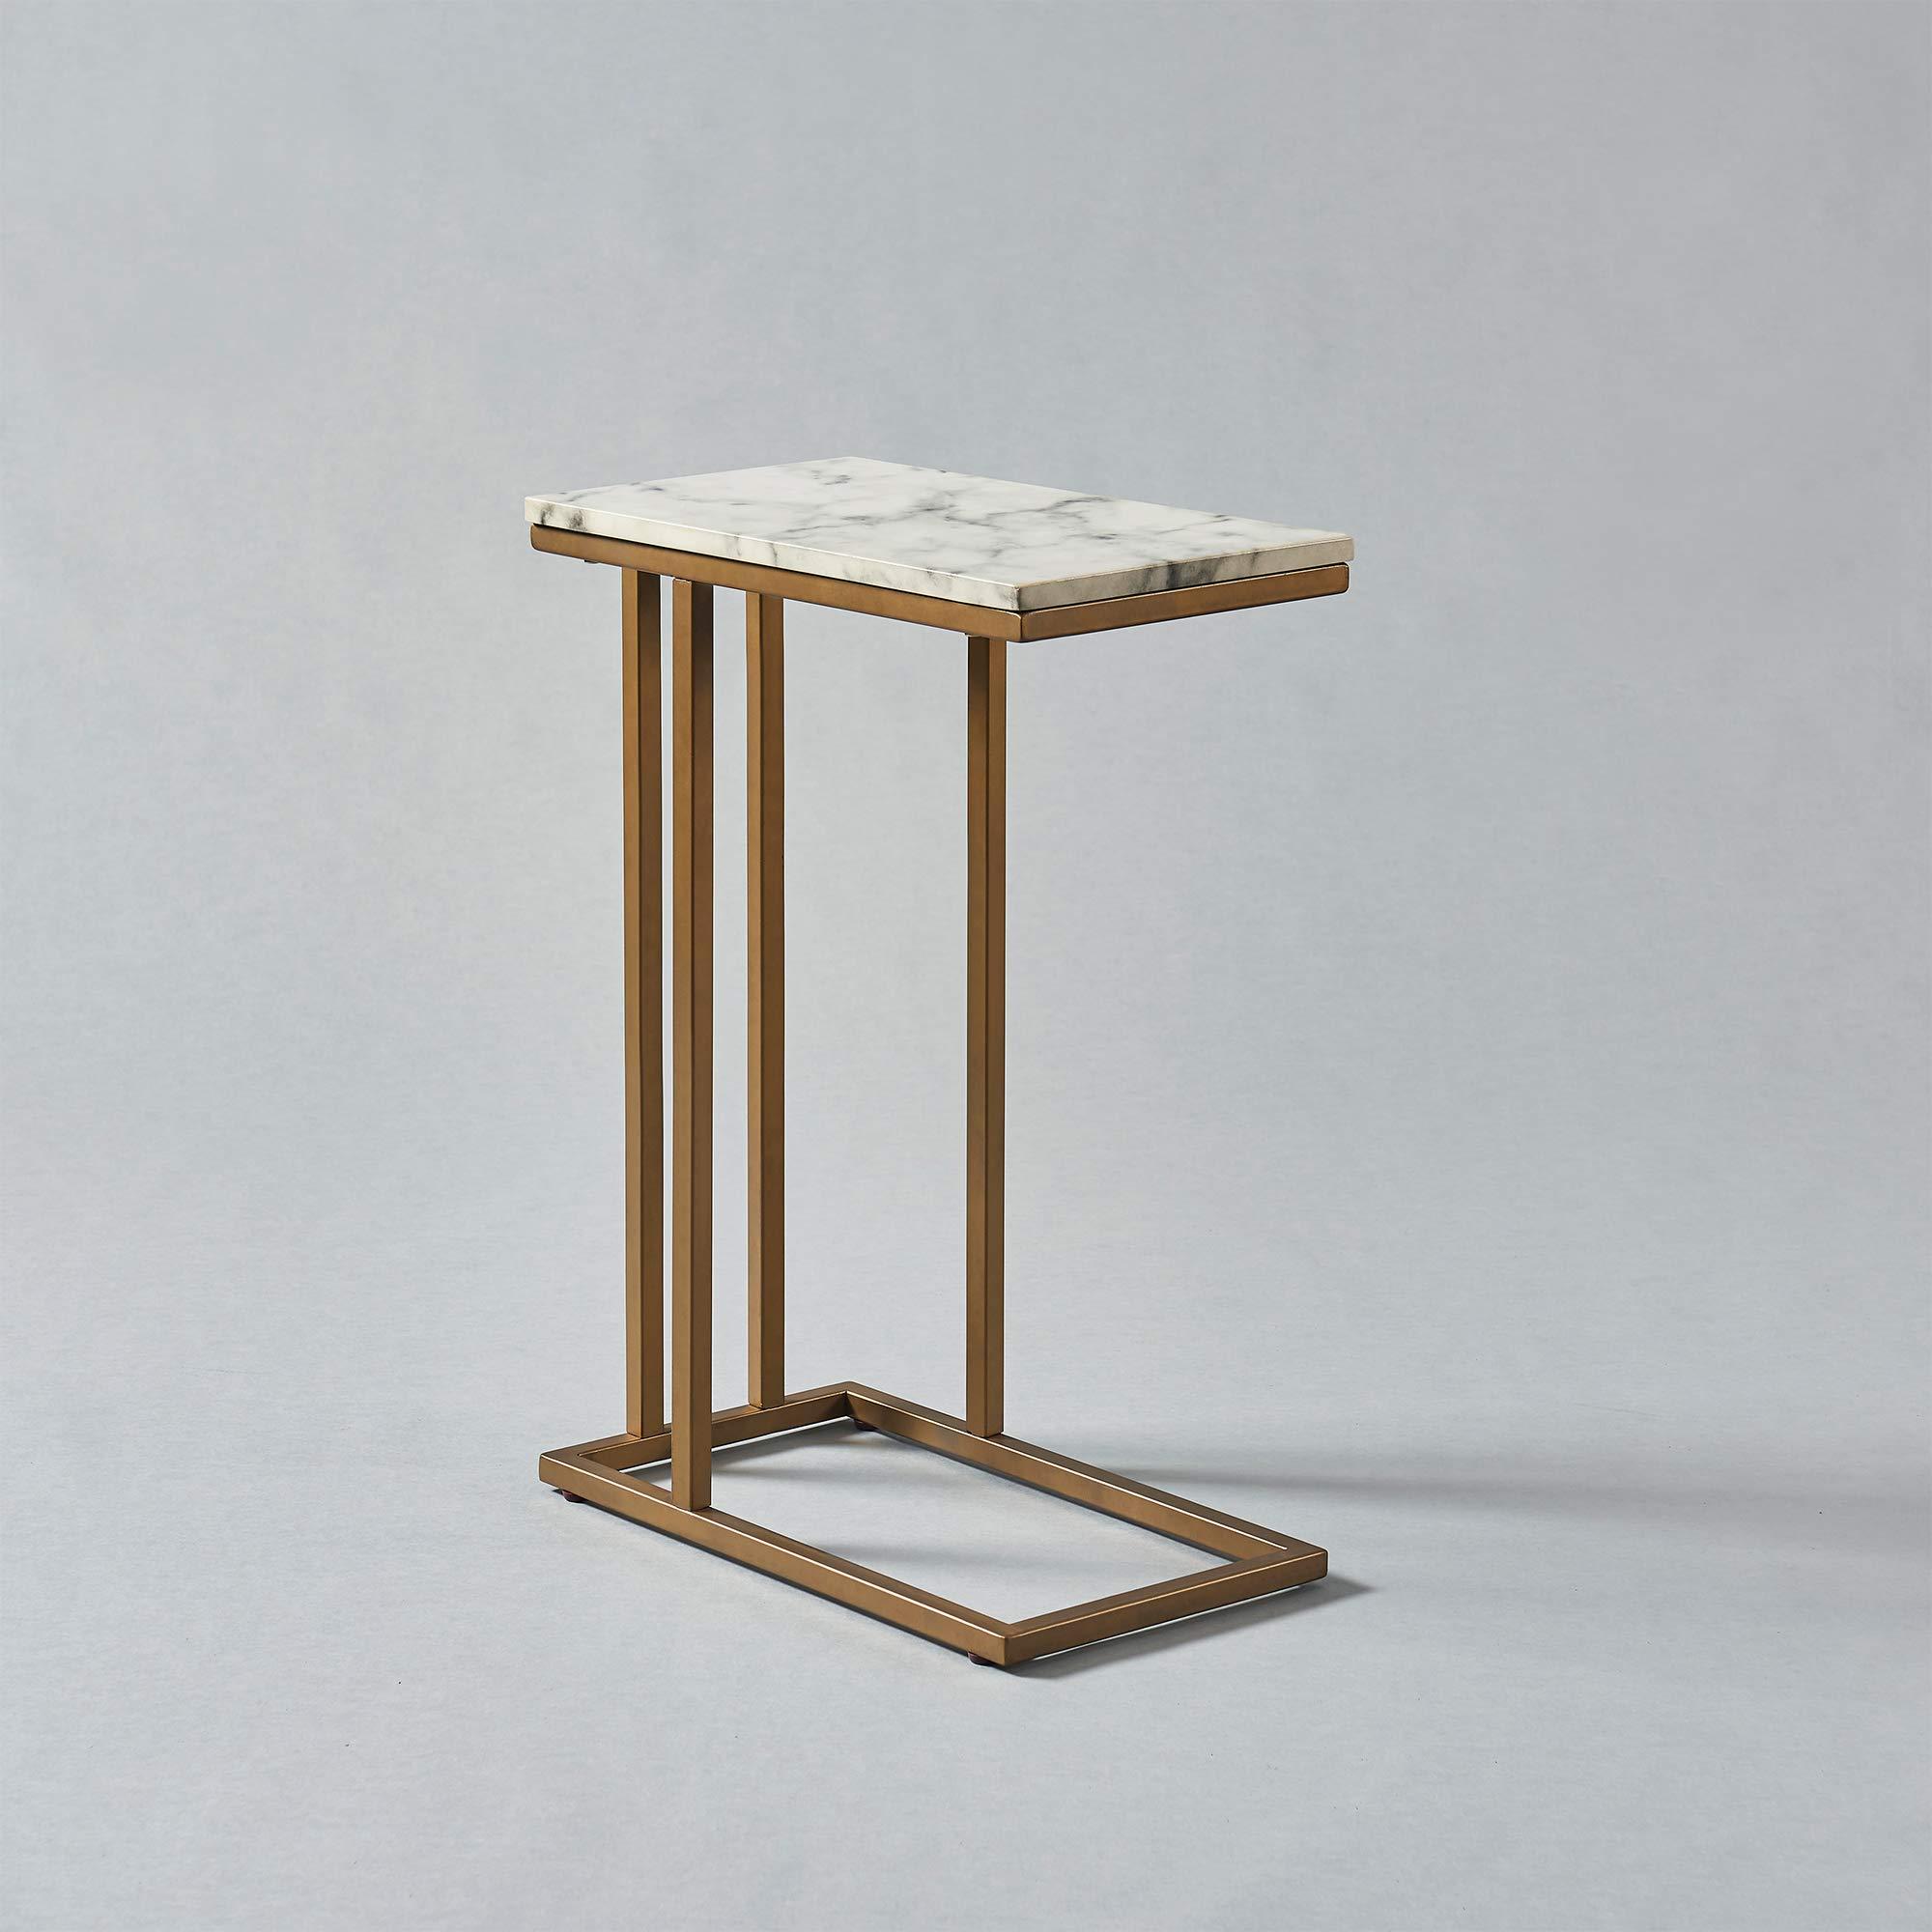 Versanora - Marmo C Shape Table - Faux Marble /Brass by Versanora (Image #13)